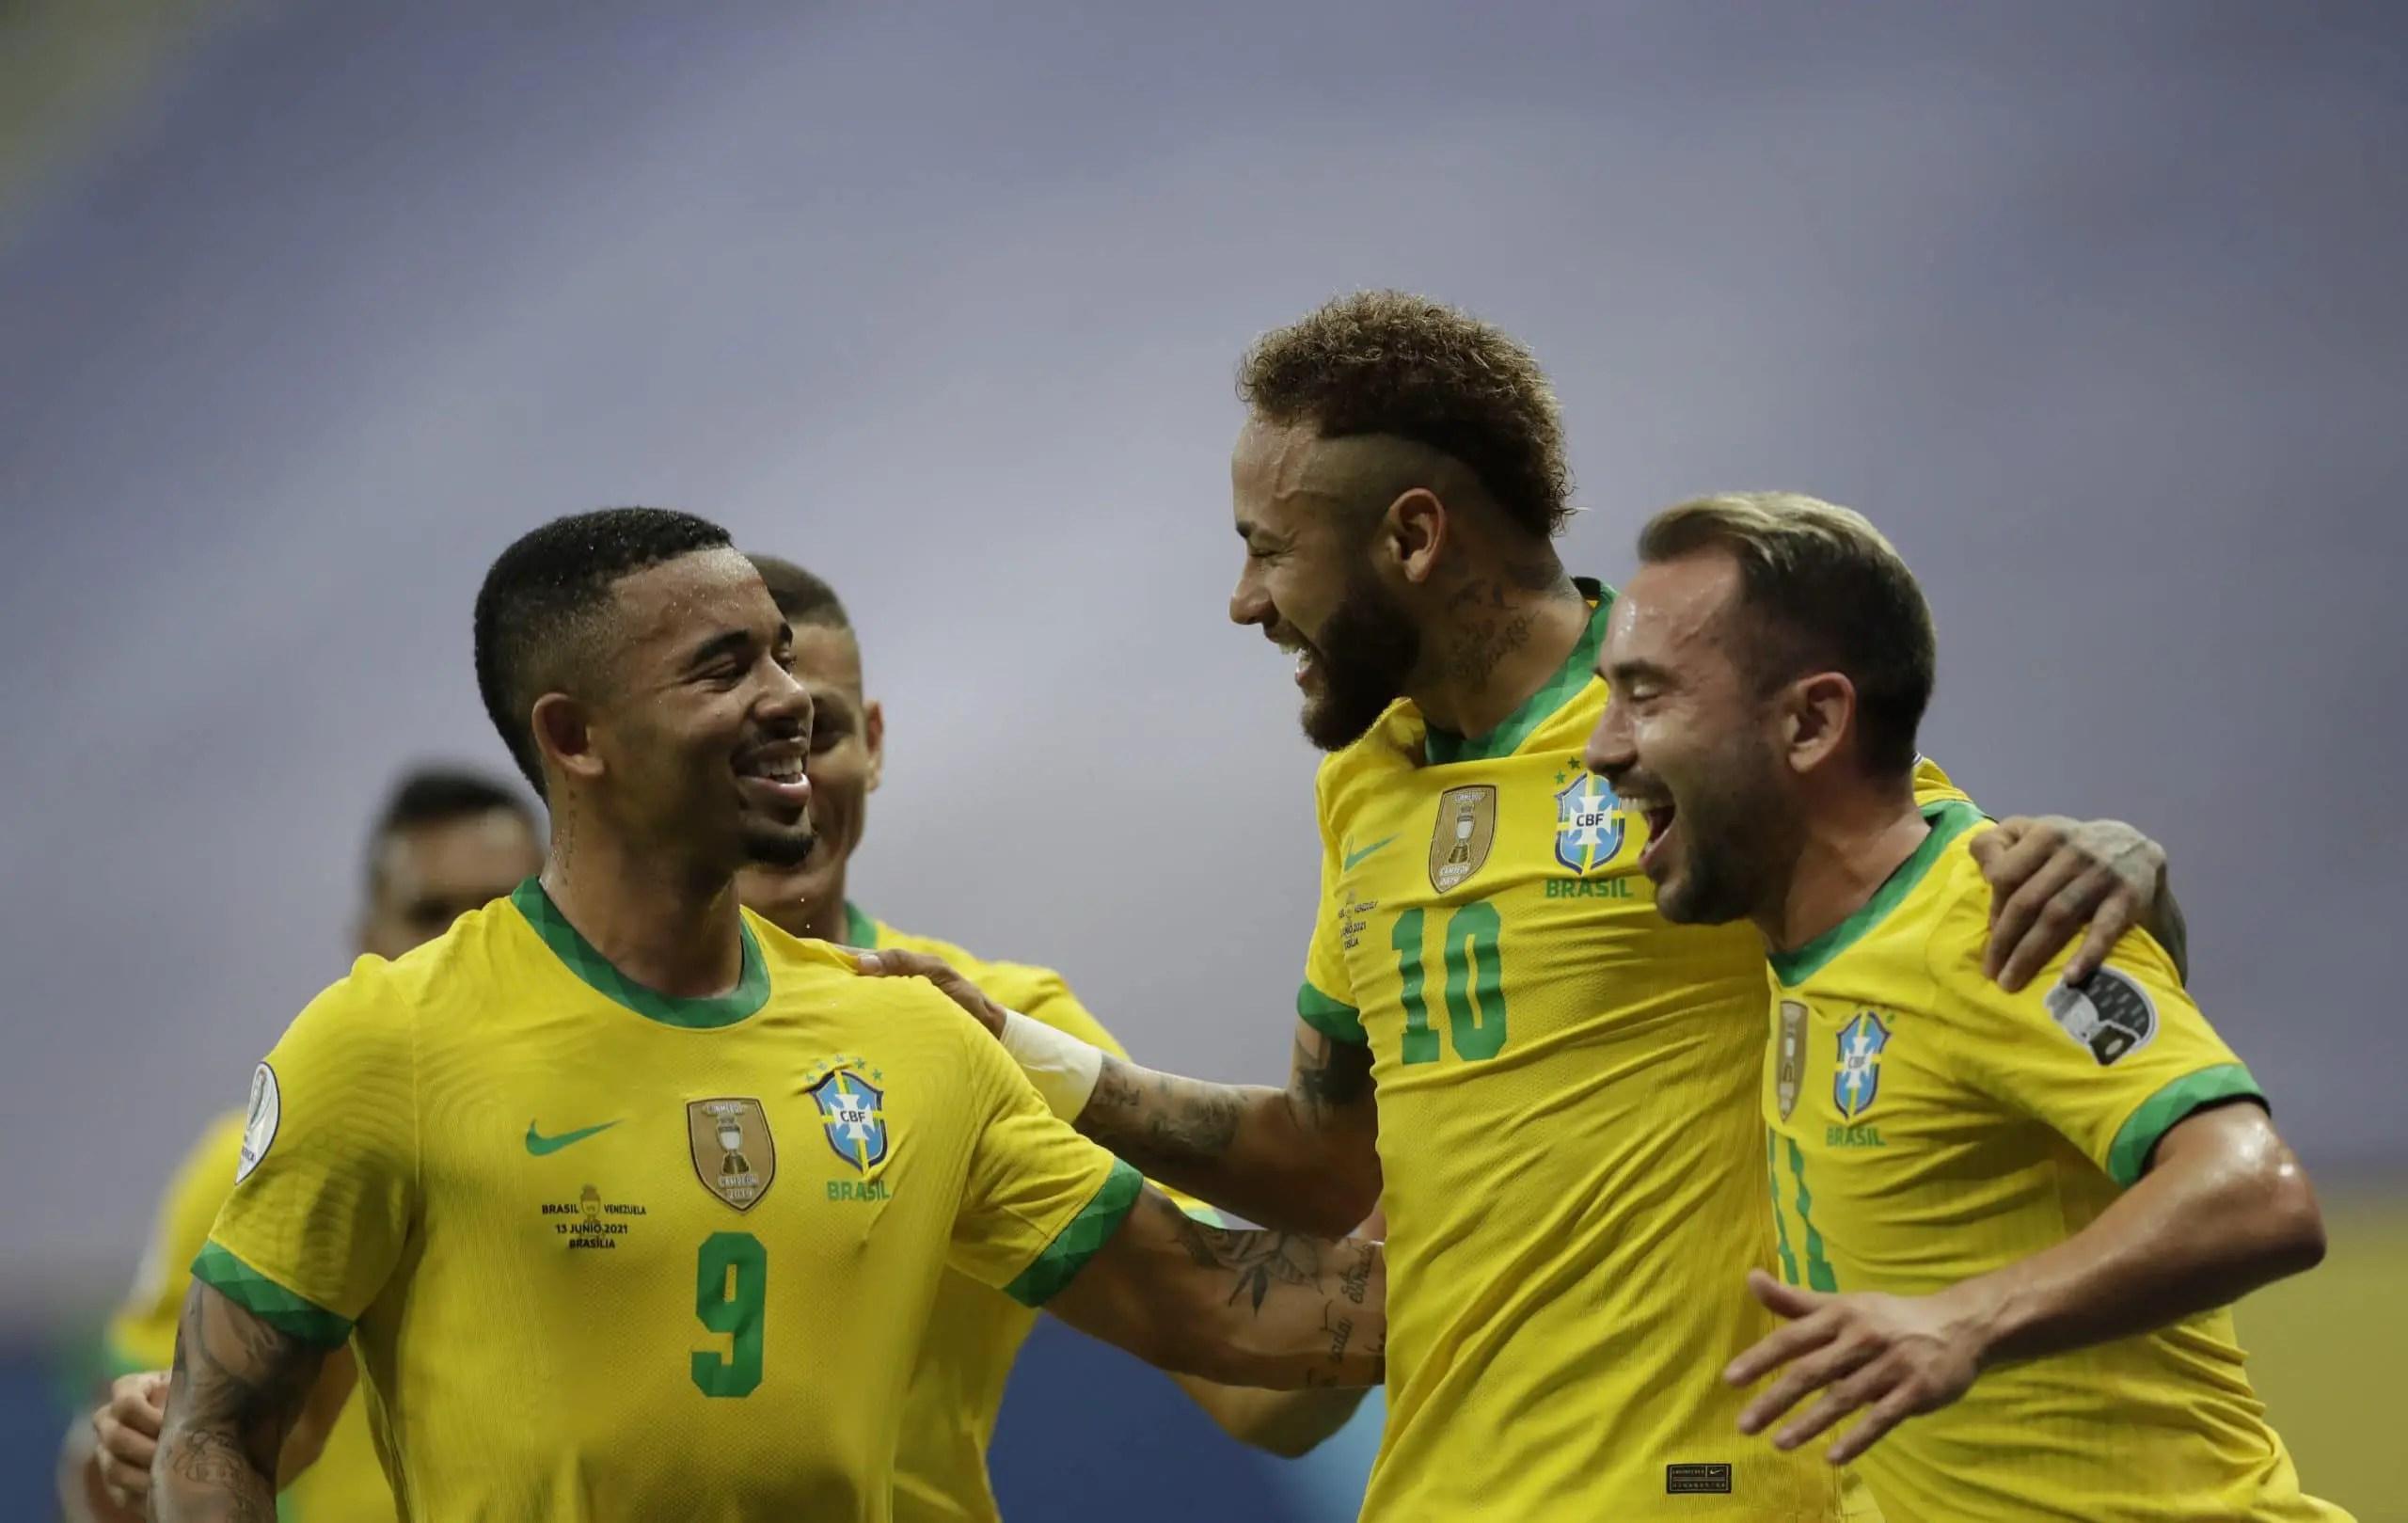 Copa America: Neymar On Target Again, Closes In On Pele's Record As Brazil Thrash Peru